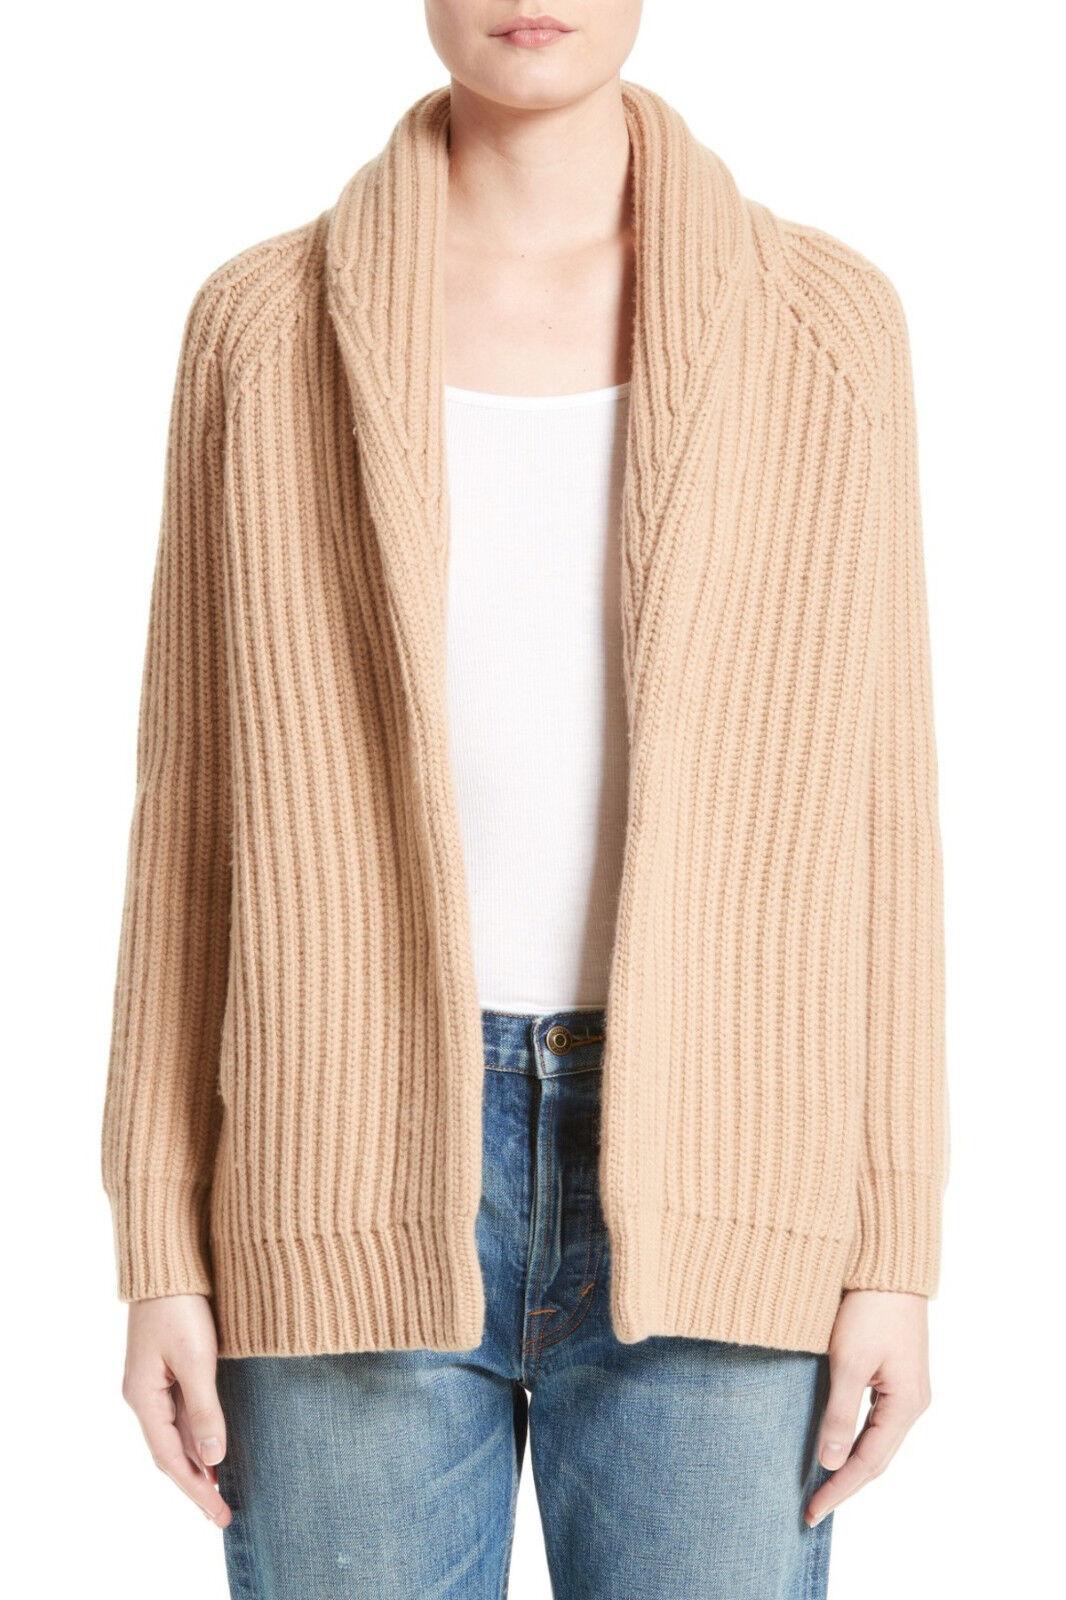 V810 Vince Rib Wool Cashmere Car Coat Women Cardigan Size M   eBay